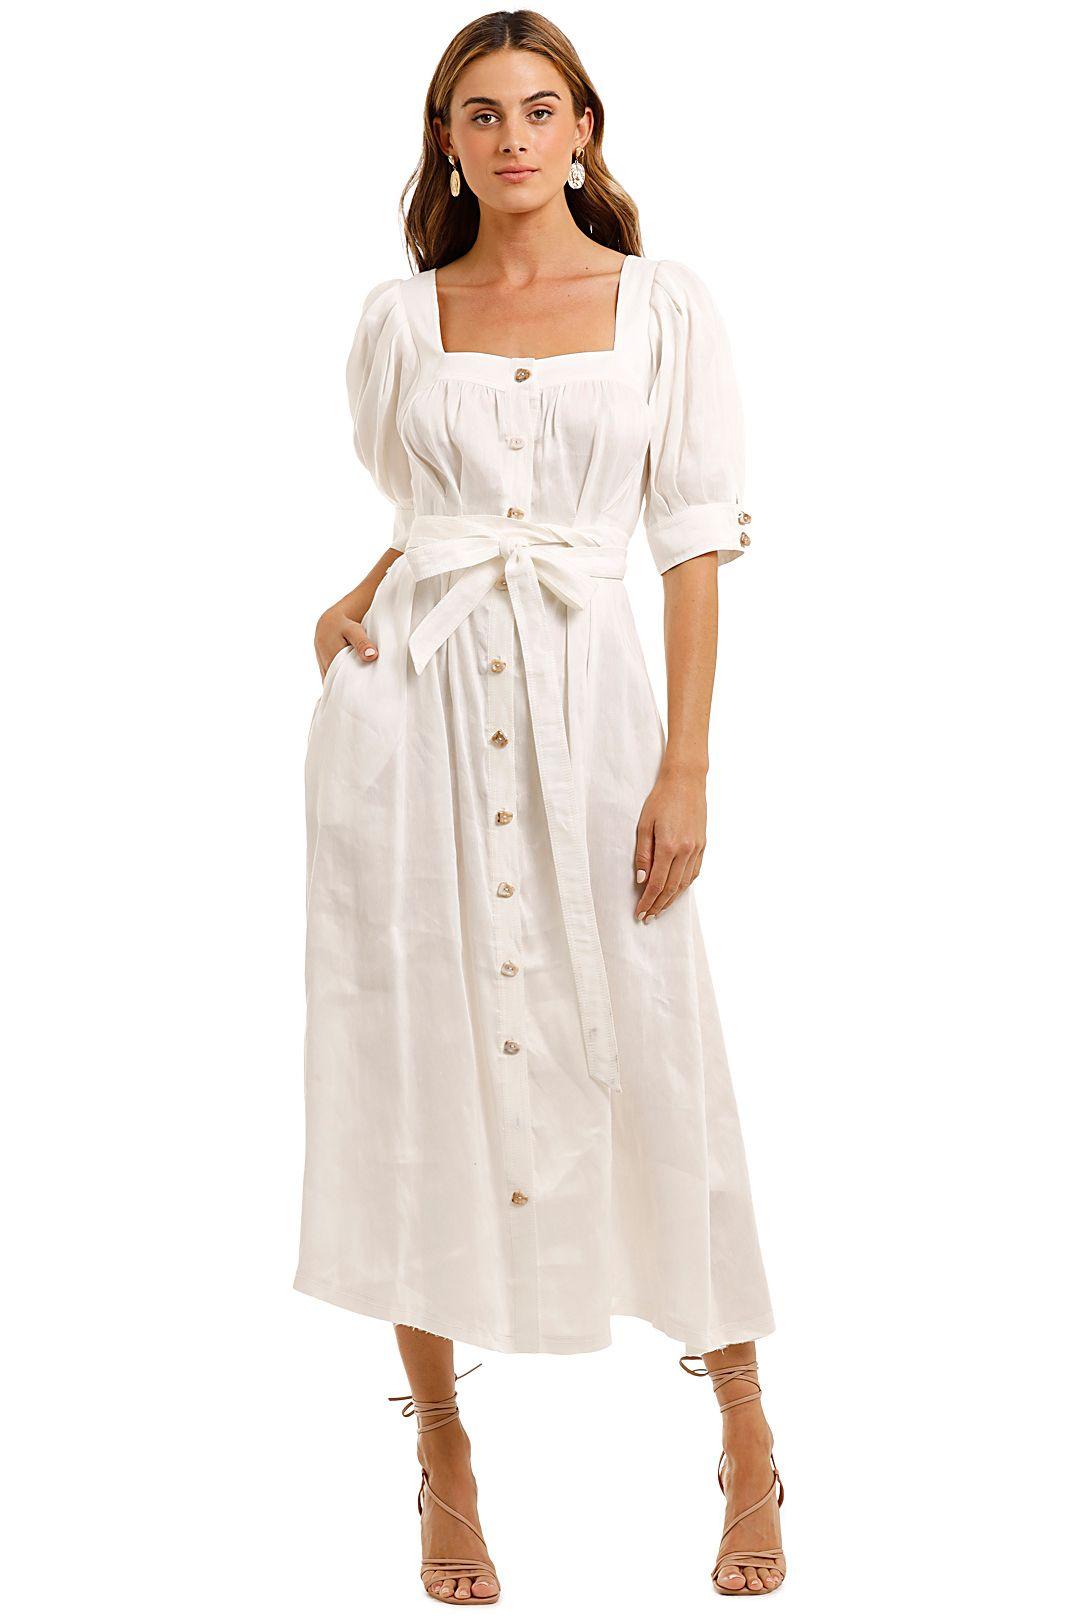 AJE Aspect Midi Dress straight square neck